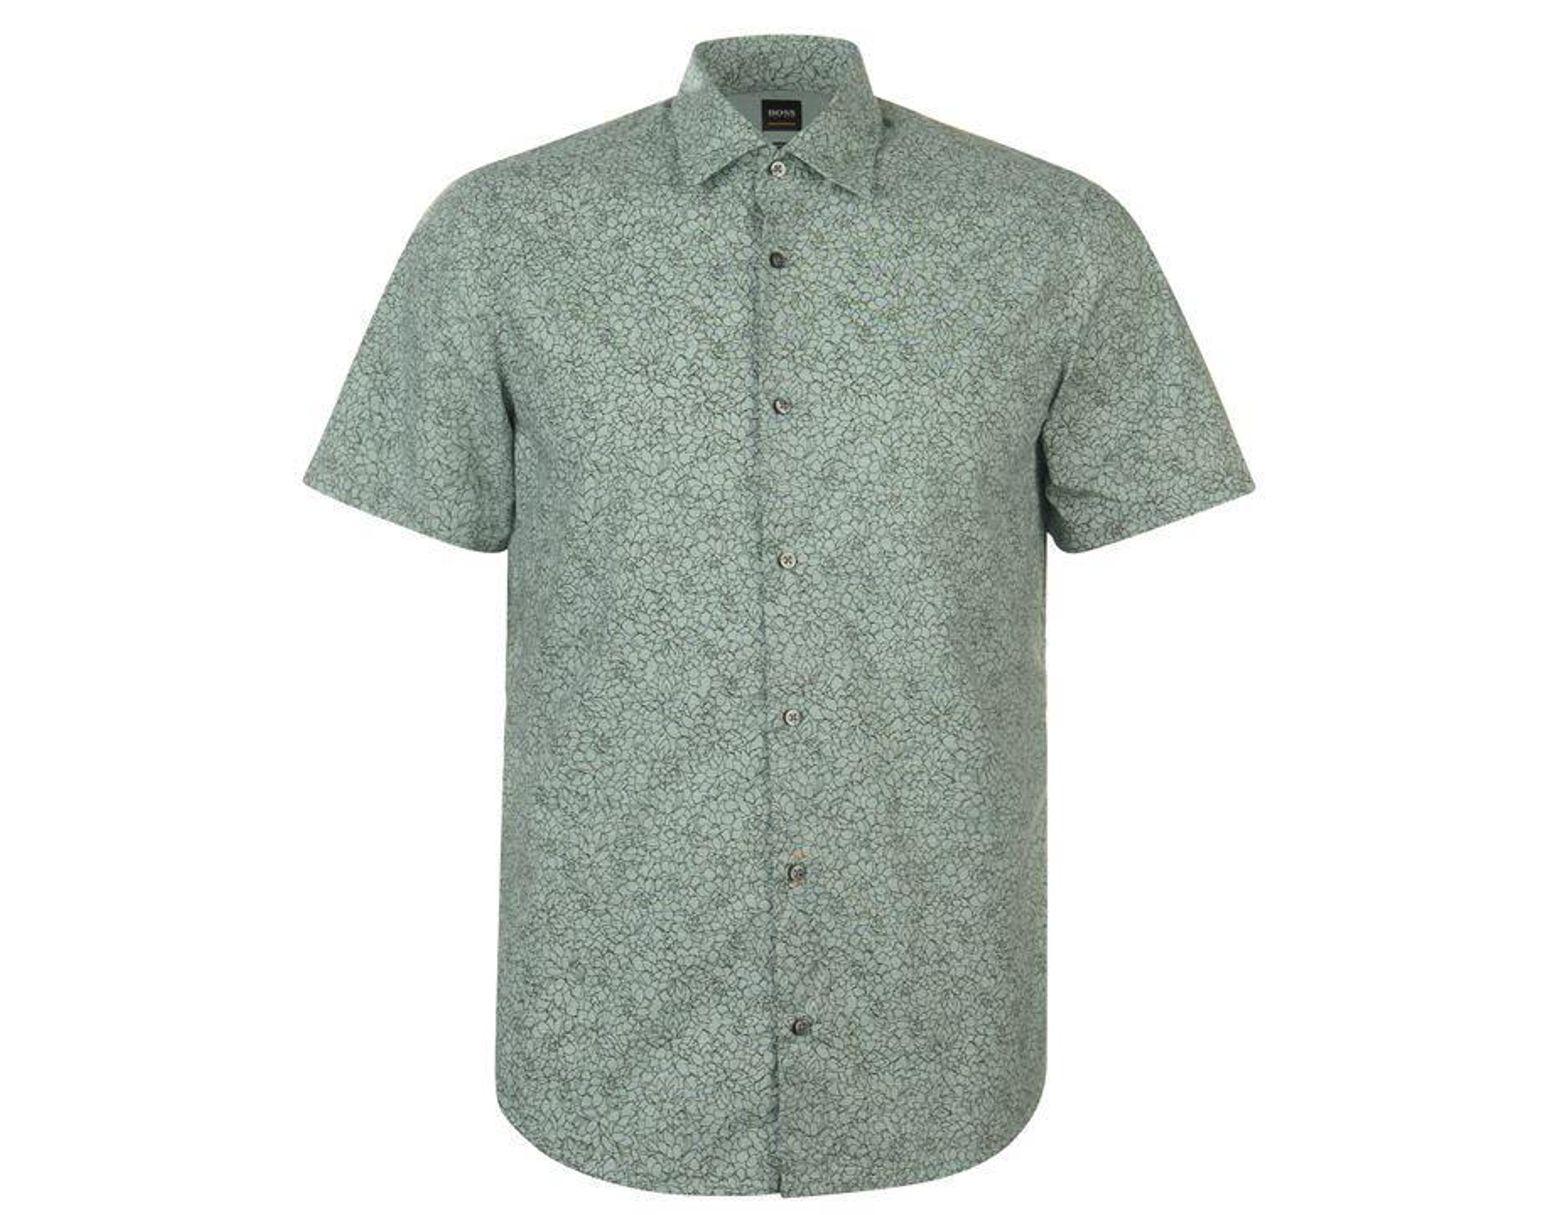 b5c62a649 BOSS by Hugo Boss Boss Rash Floral Shirt in Green for Men - Lyst